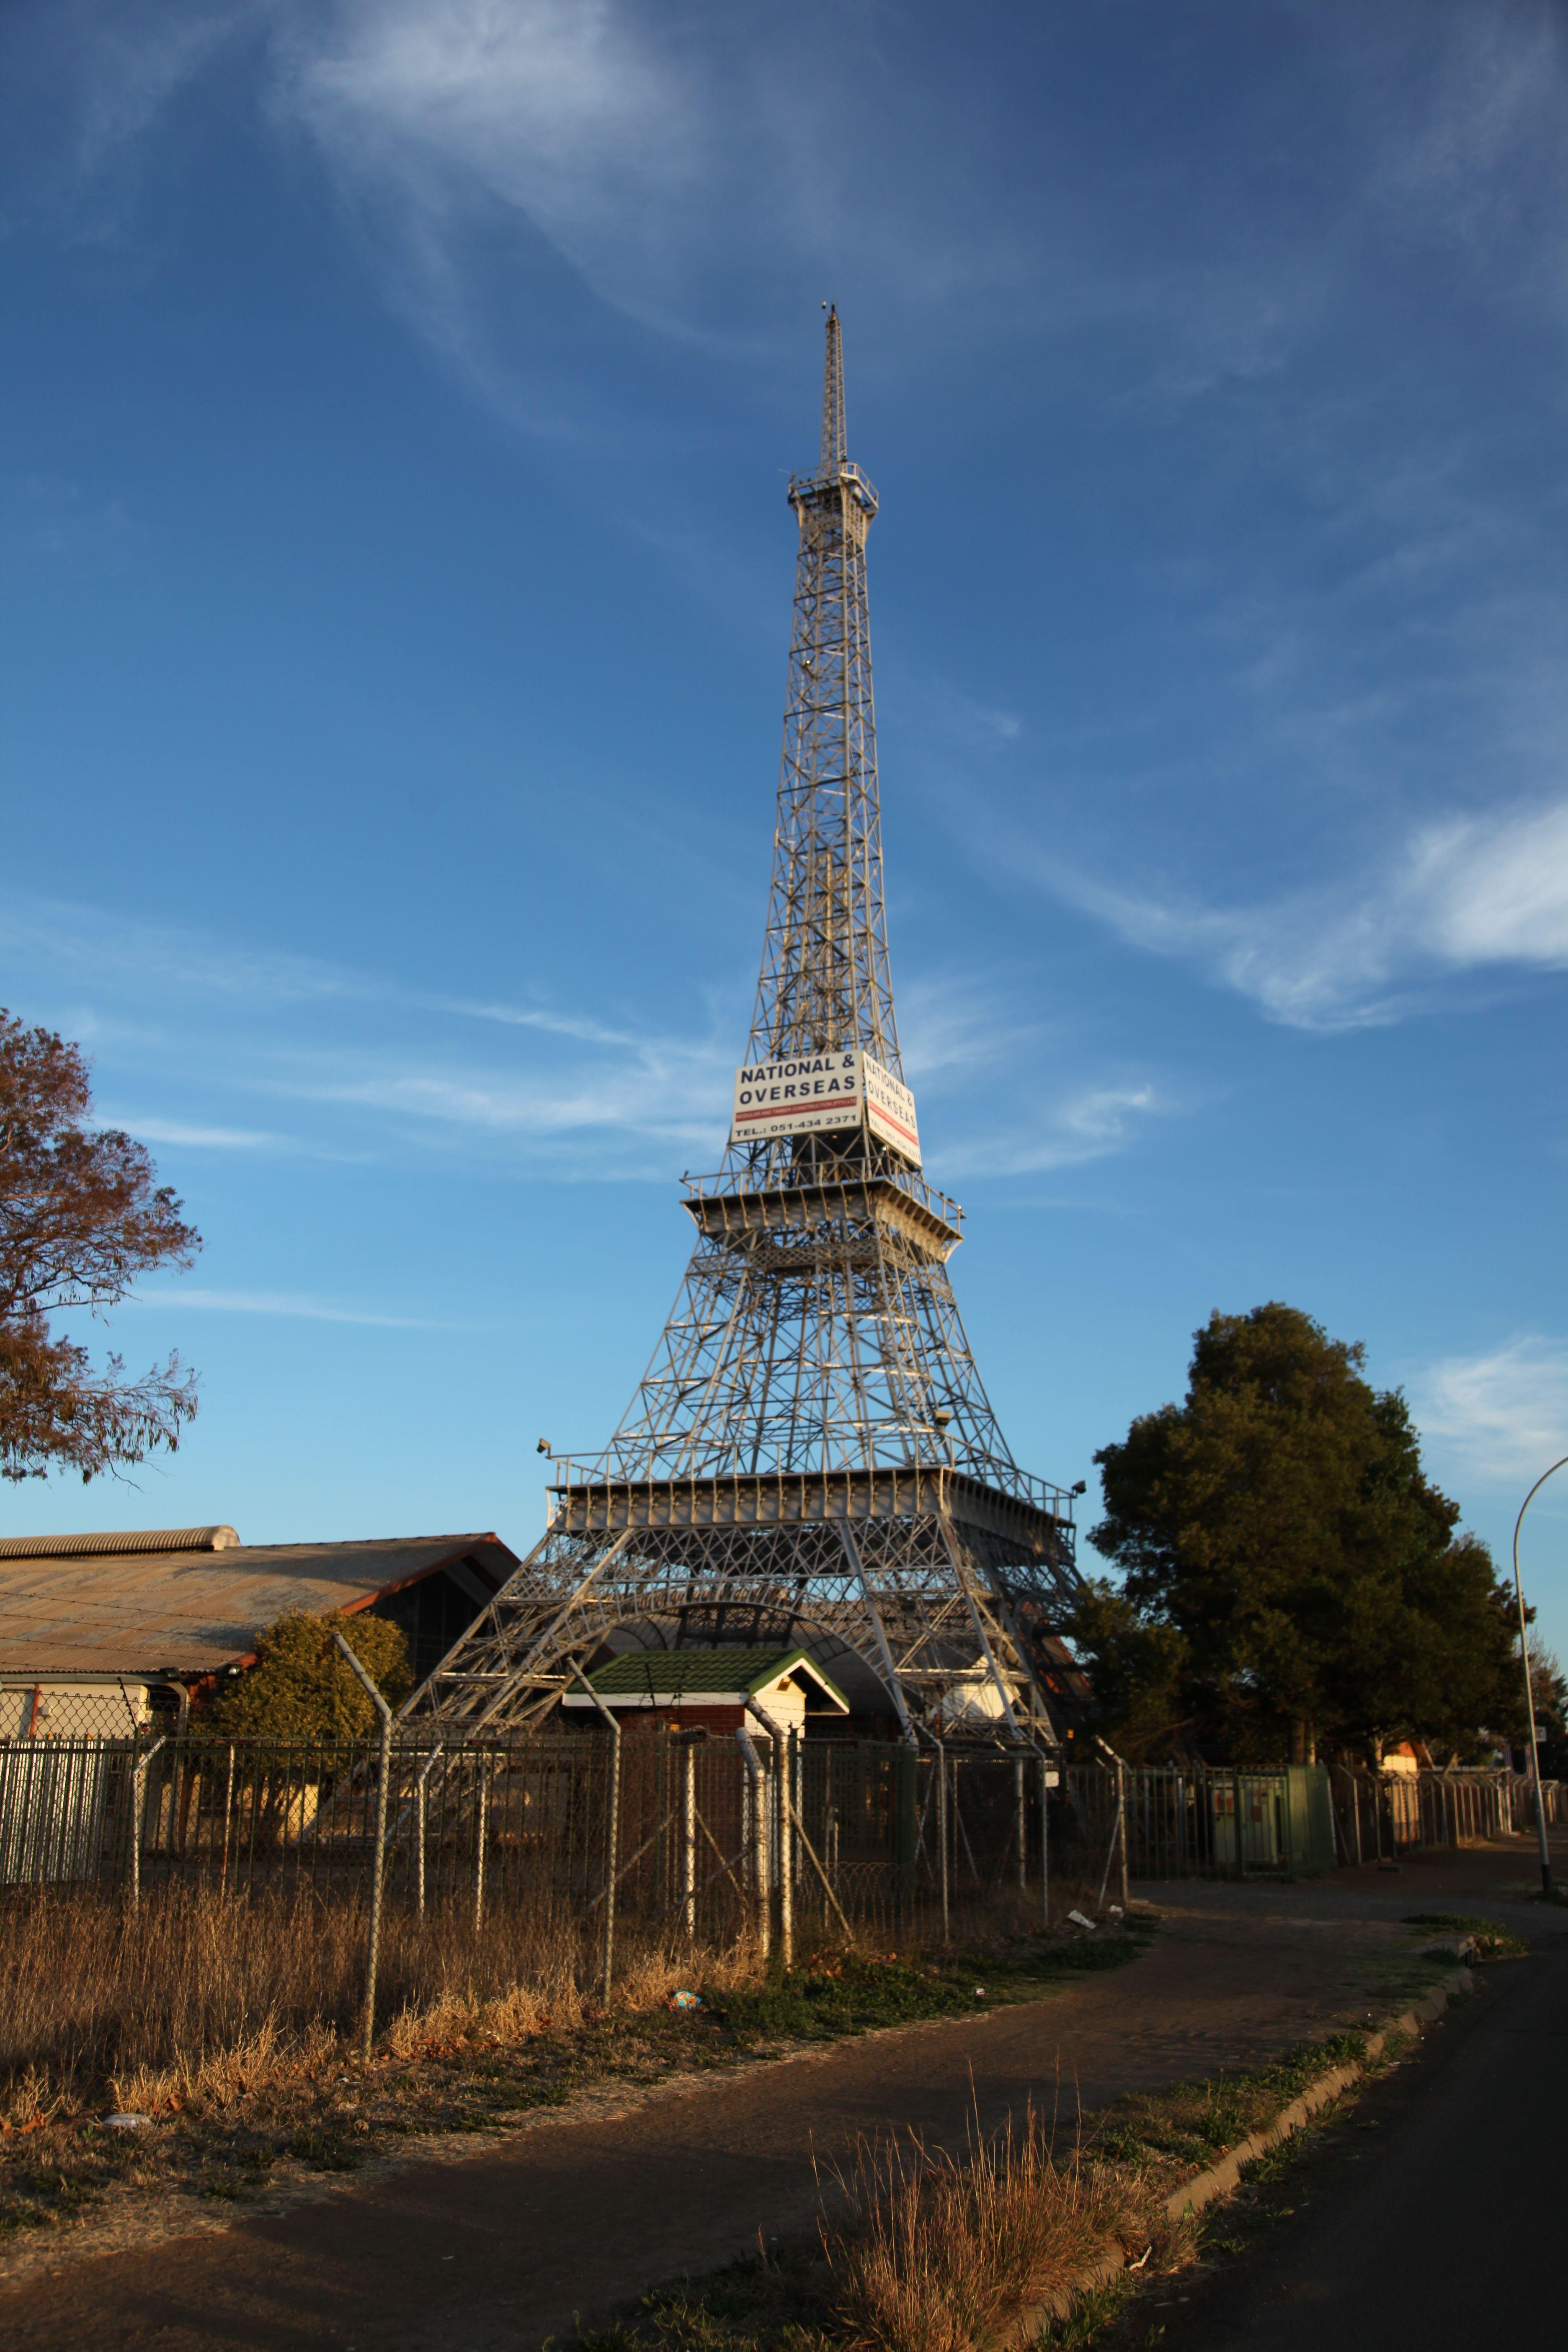 Bloemfontein Eiffel Tower 001 Jpg 3744 5616 Bloemfontein Eiffel Tower South Africa Food